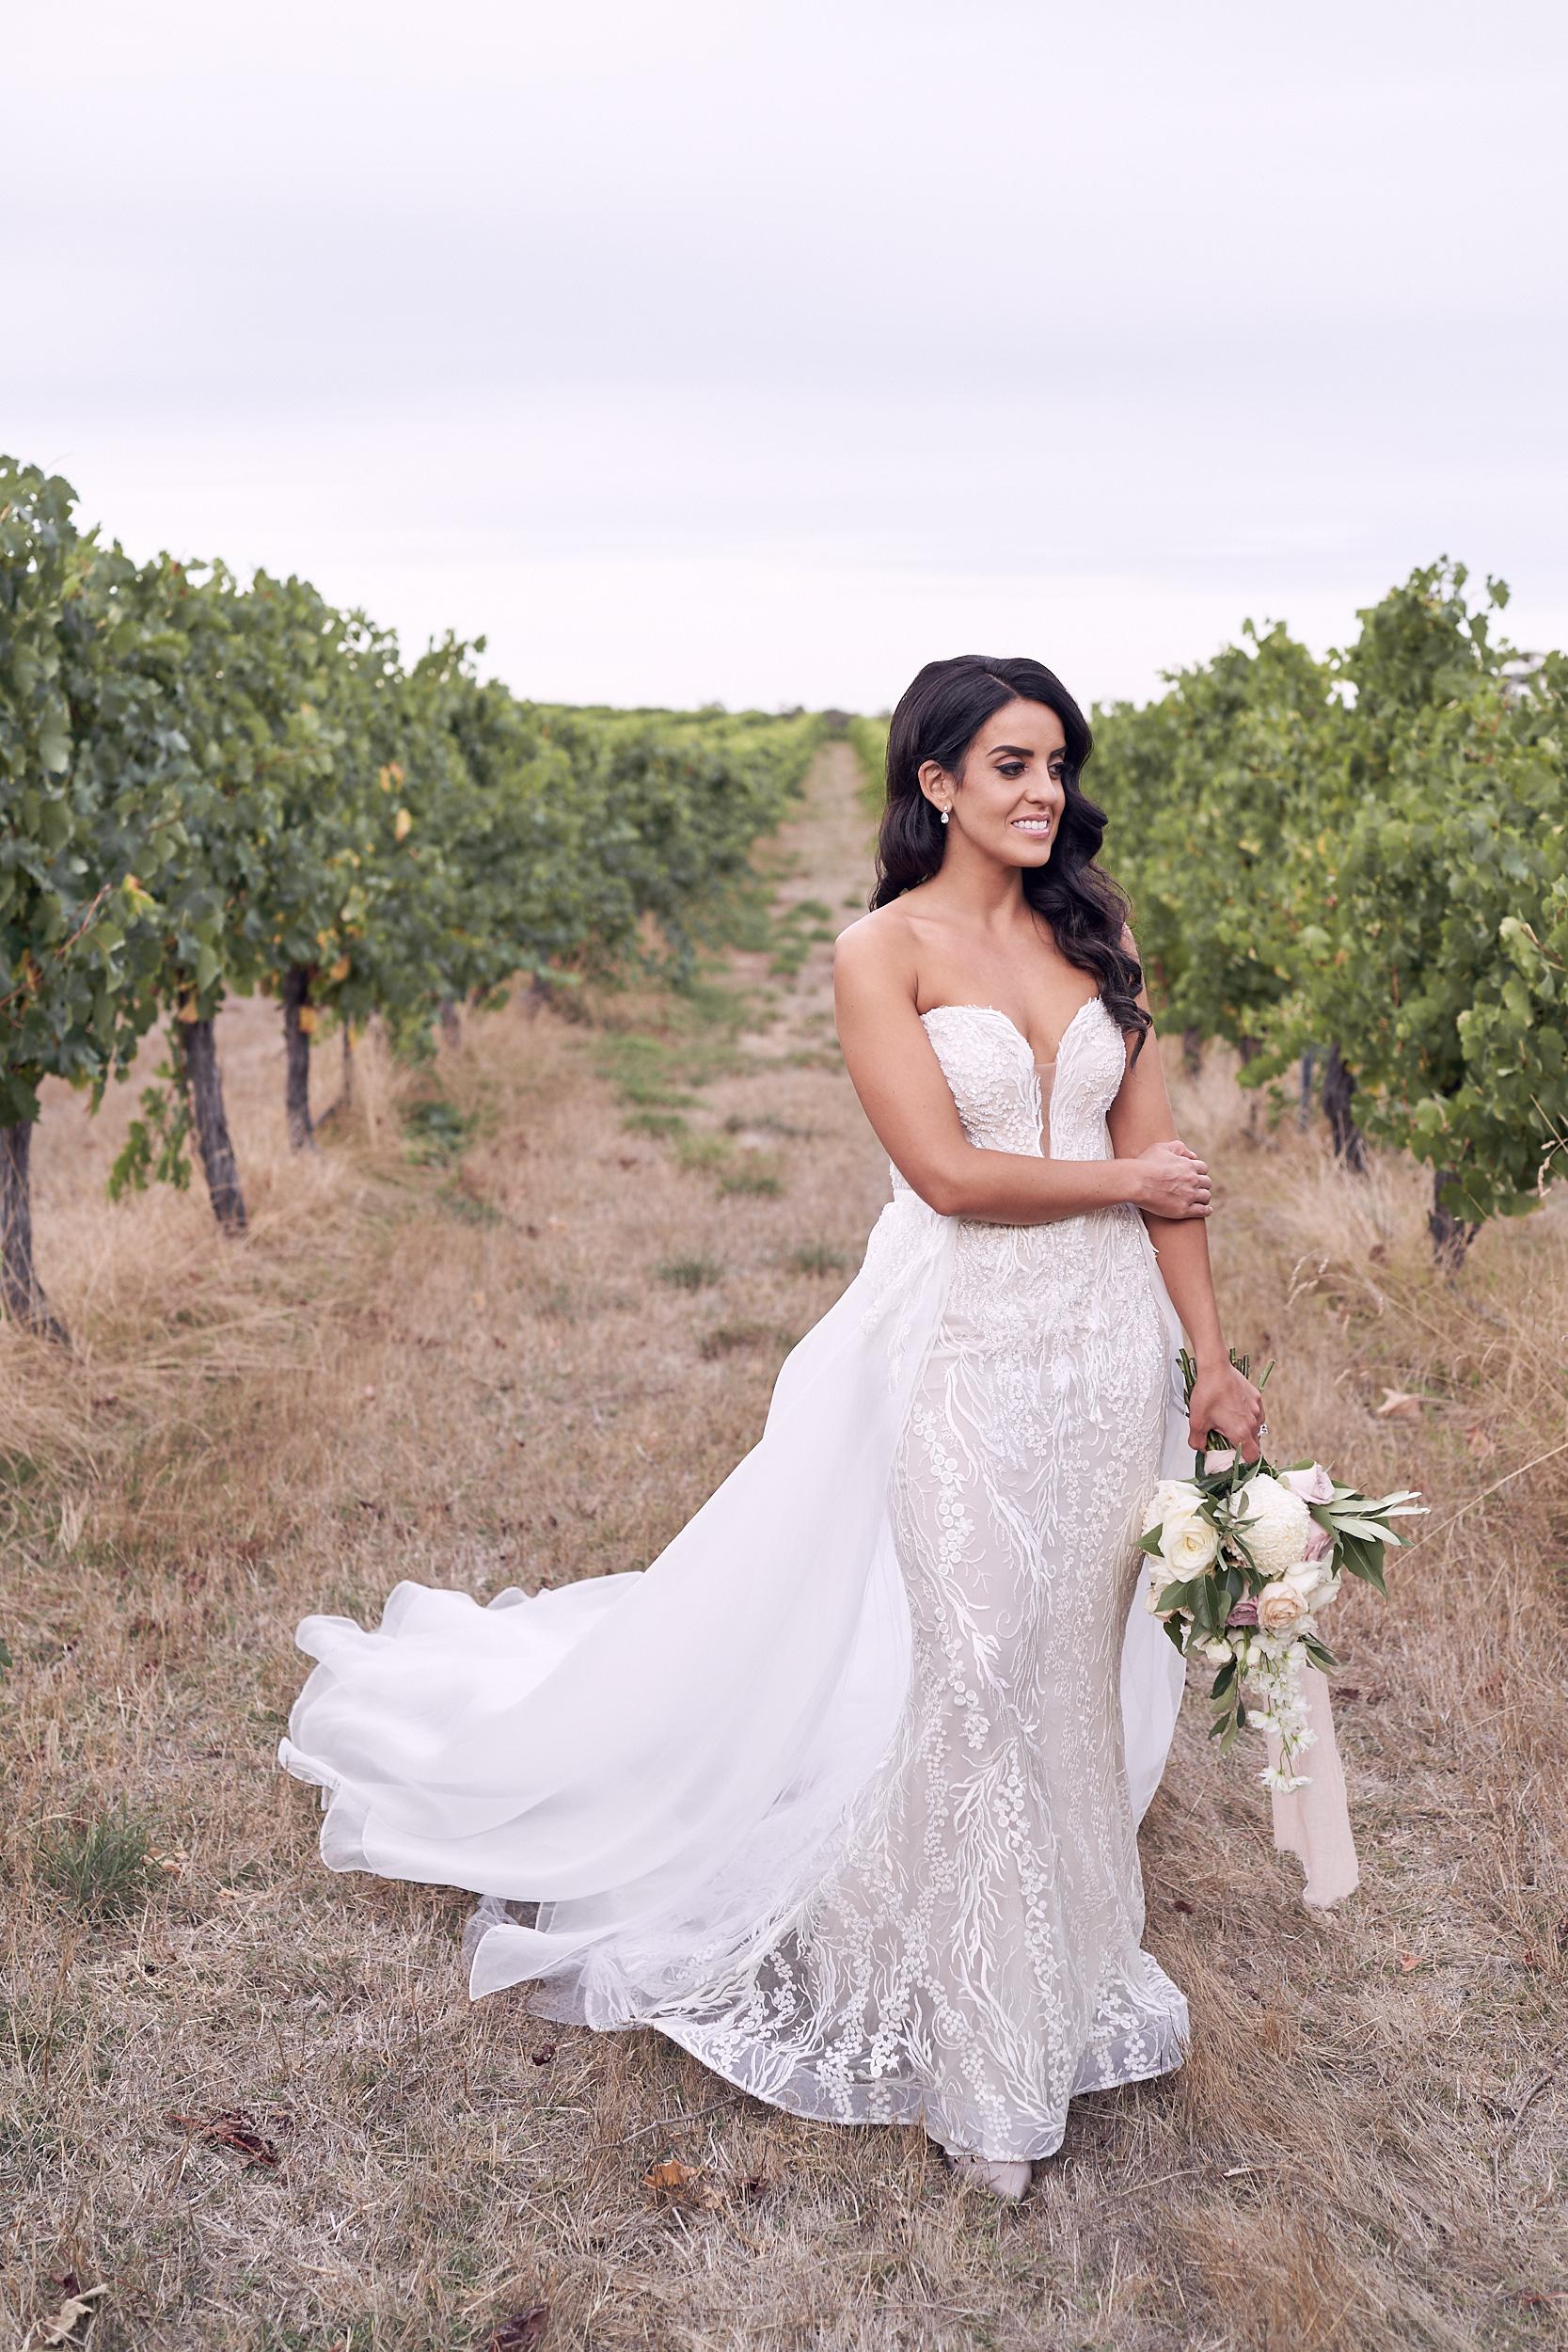 LR_JandA-aravina-wedding-LostInLove 1208.jpg